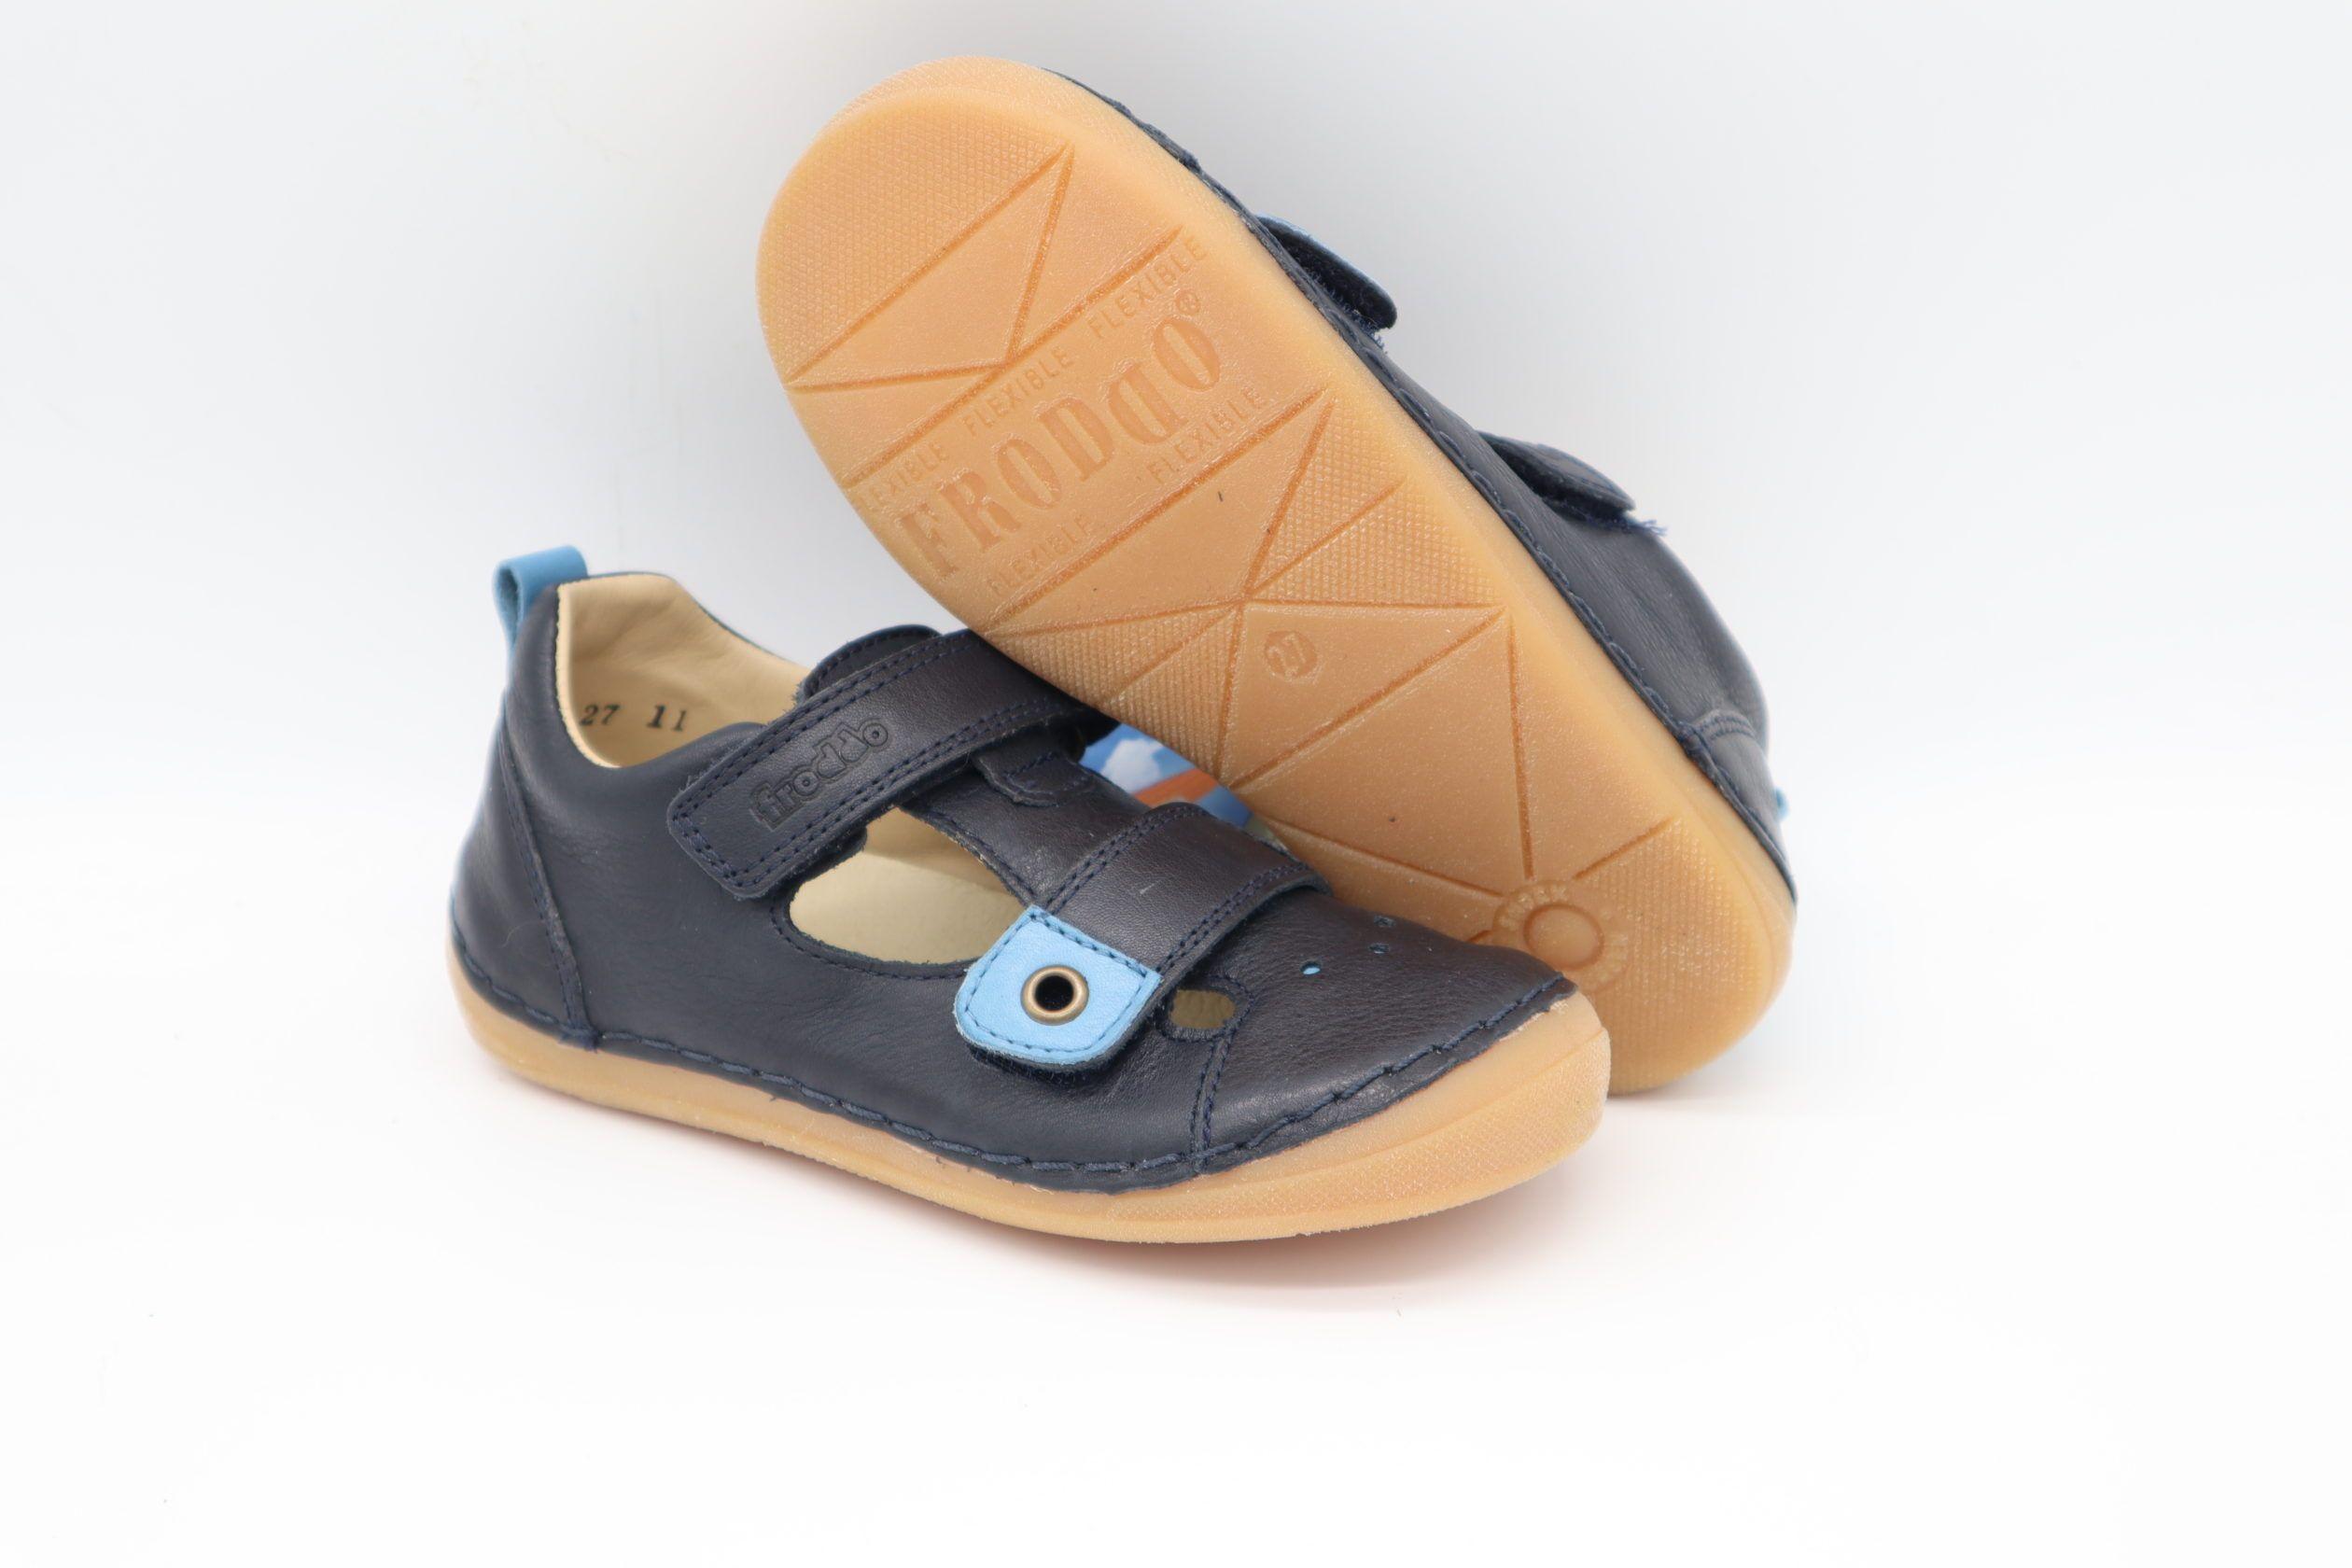 Froddo Sandalen Dark Blue Kompromiss Barfußschuhe Für Kinder Barfußschuhe Sandalen Barfuß